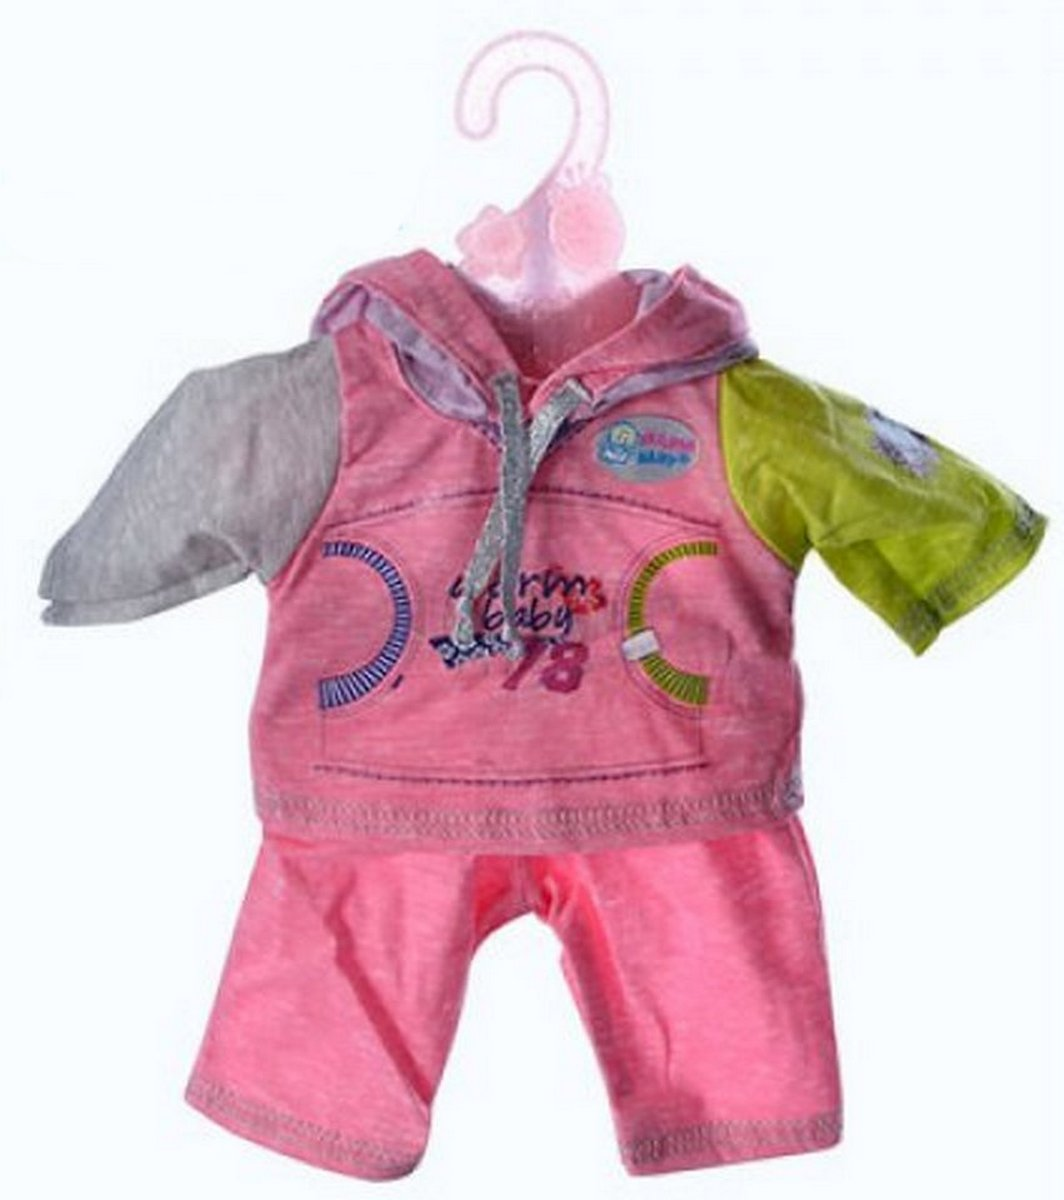 baby doll Одежда для пупса «Baby Born» 4 вида на вещалке BJ-414-DBJ-442-445A-B